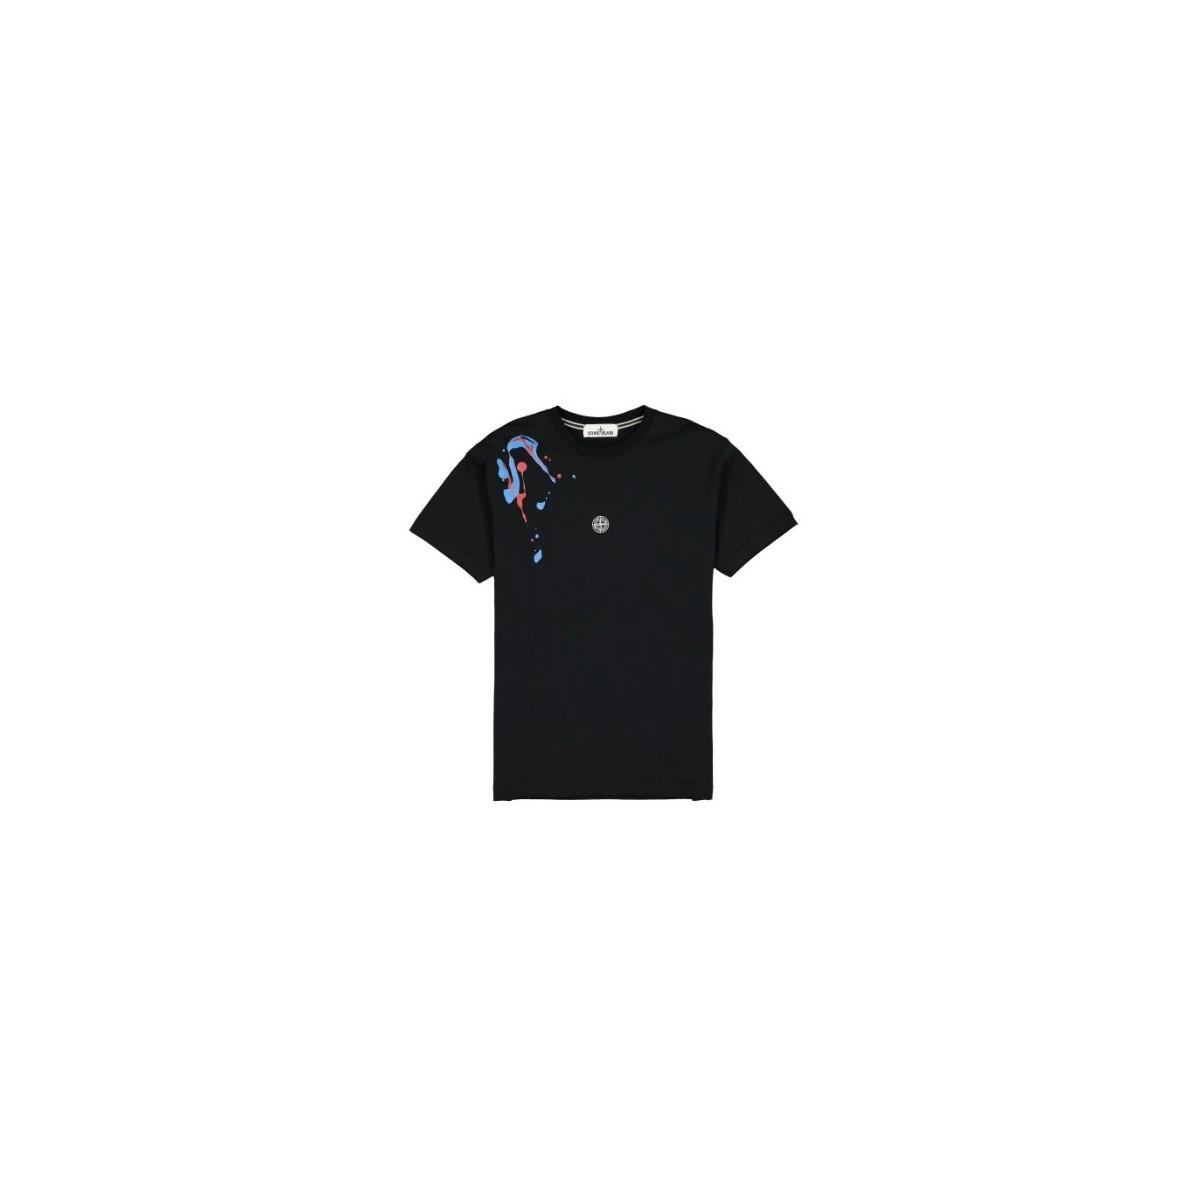 T-shirt - 2ns81 t-shirt stampa